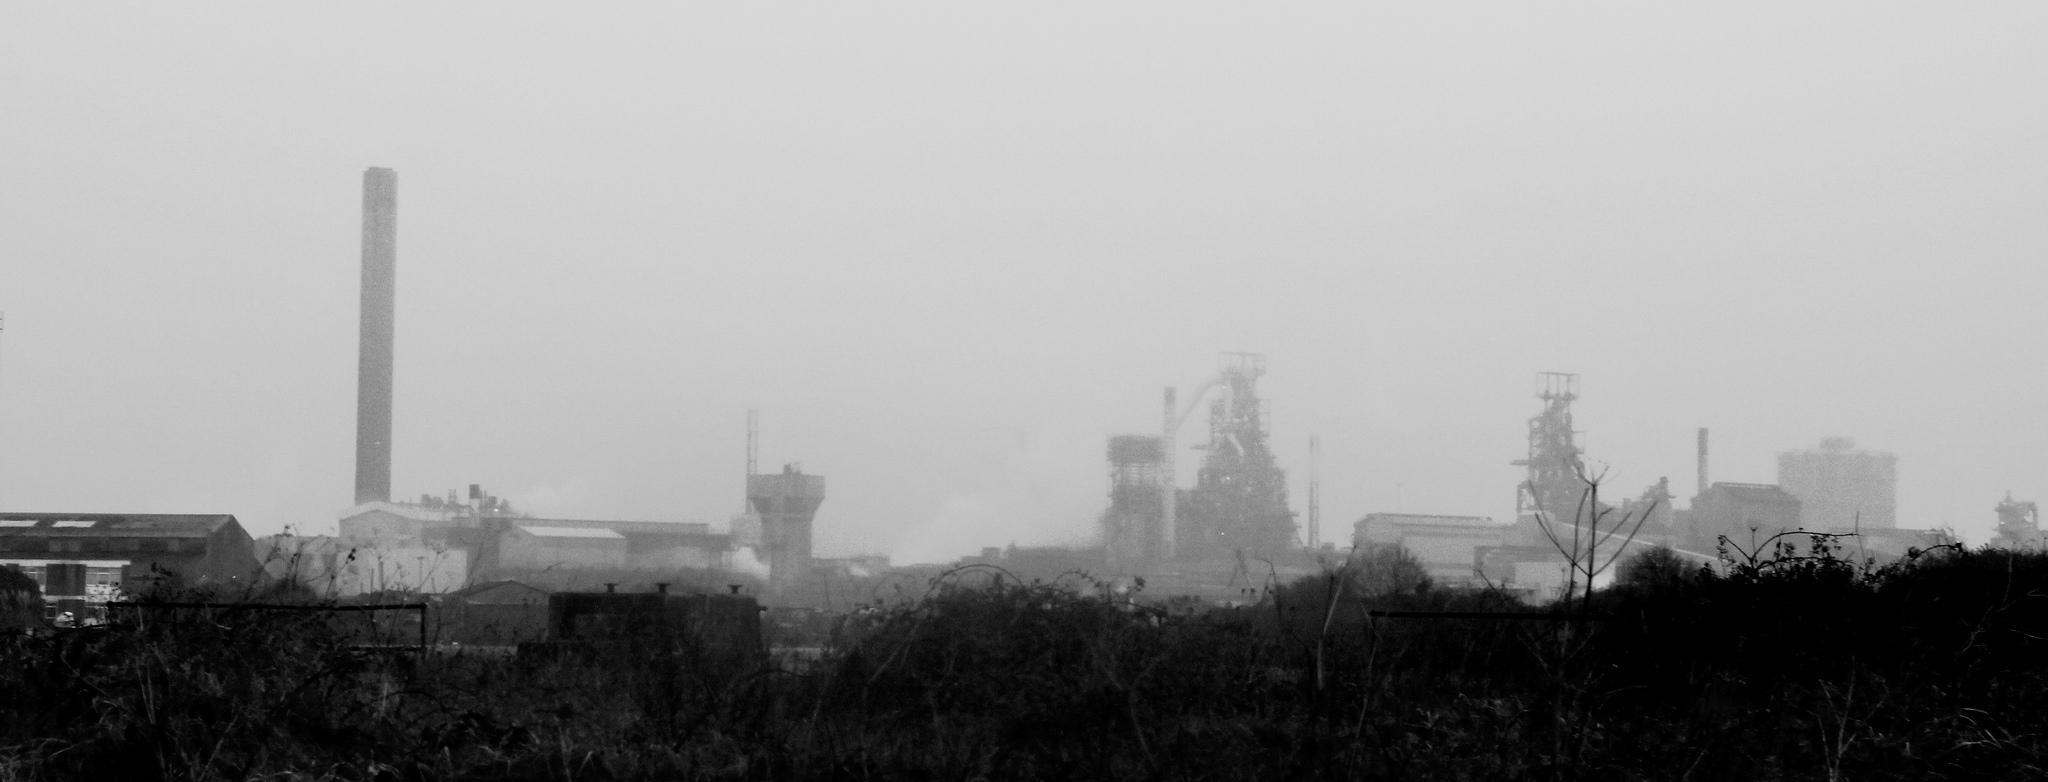 Llanwern Steelworks, Port Talbot, Wales.